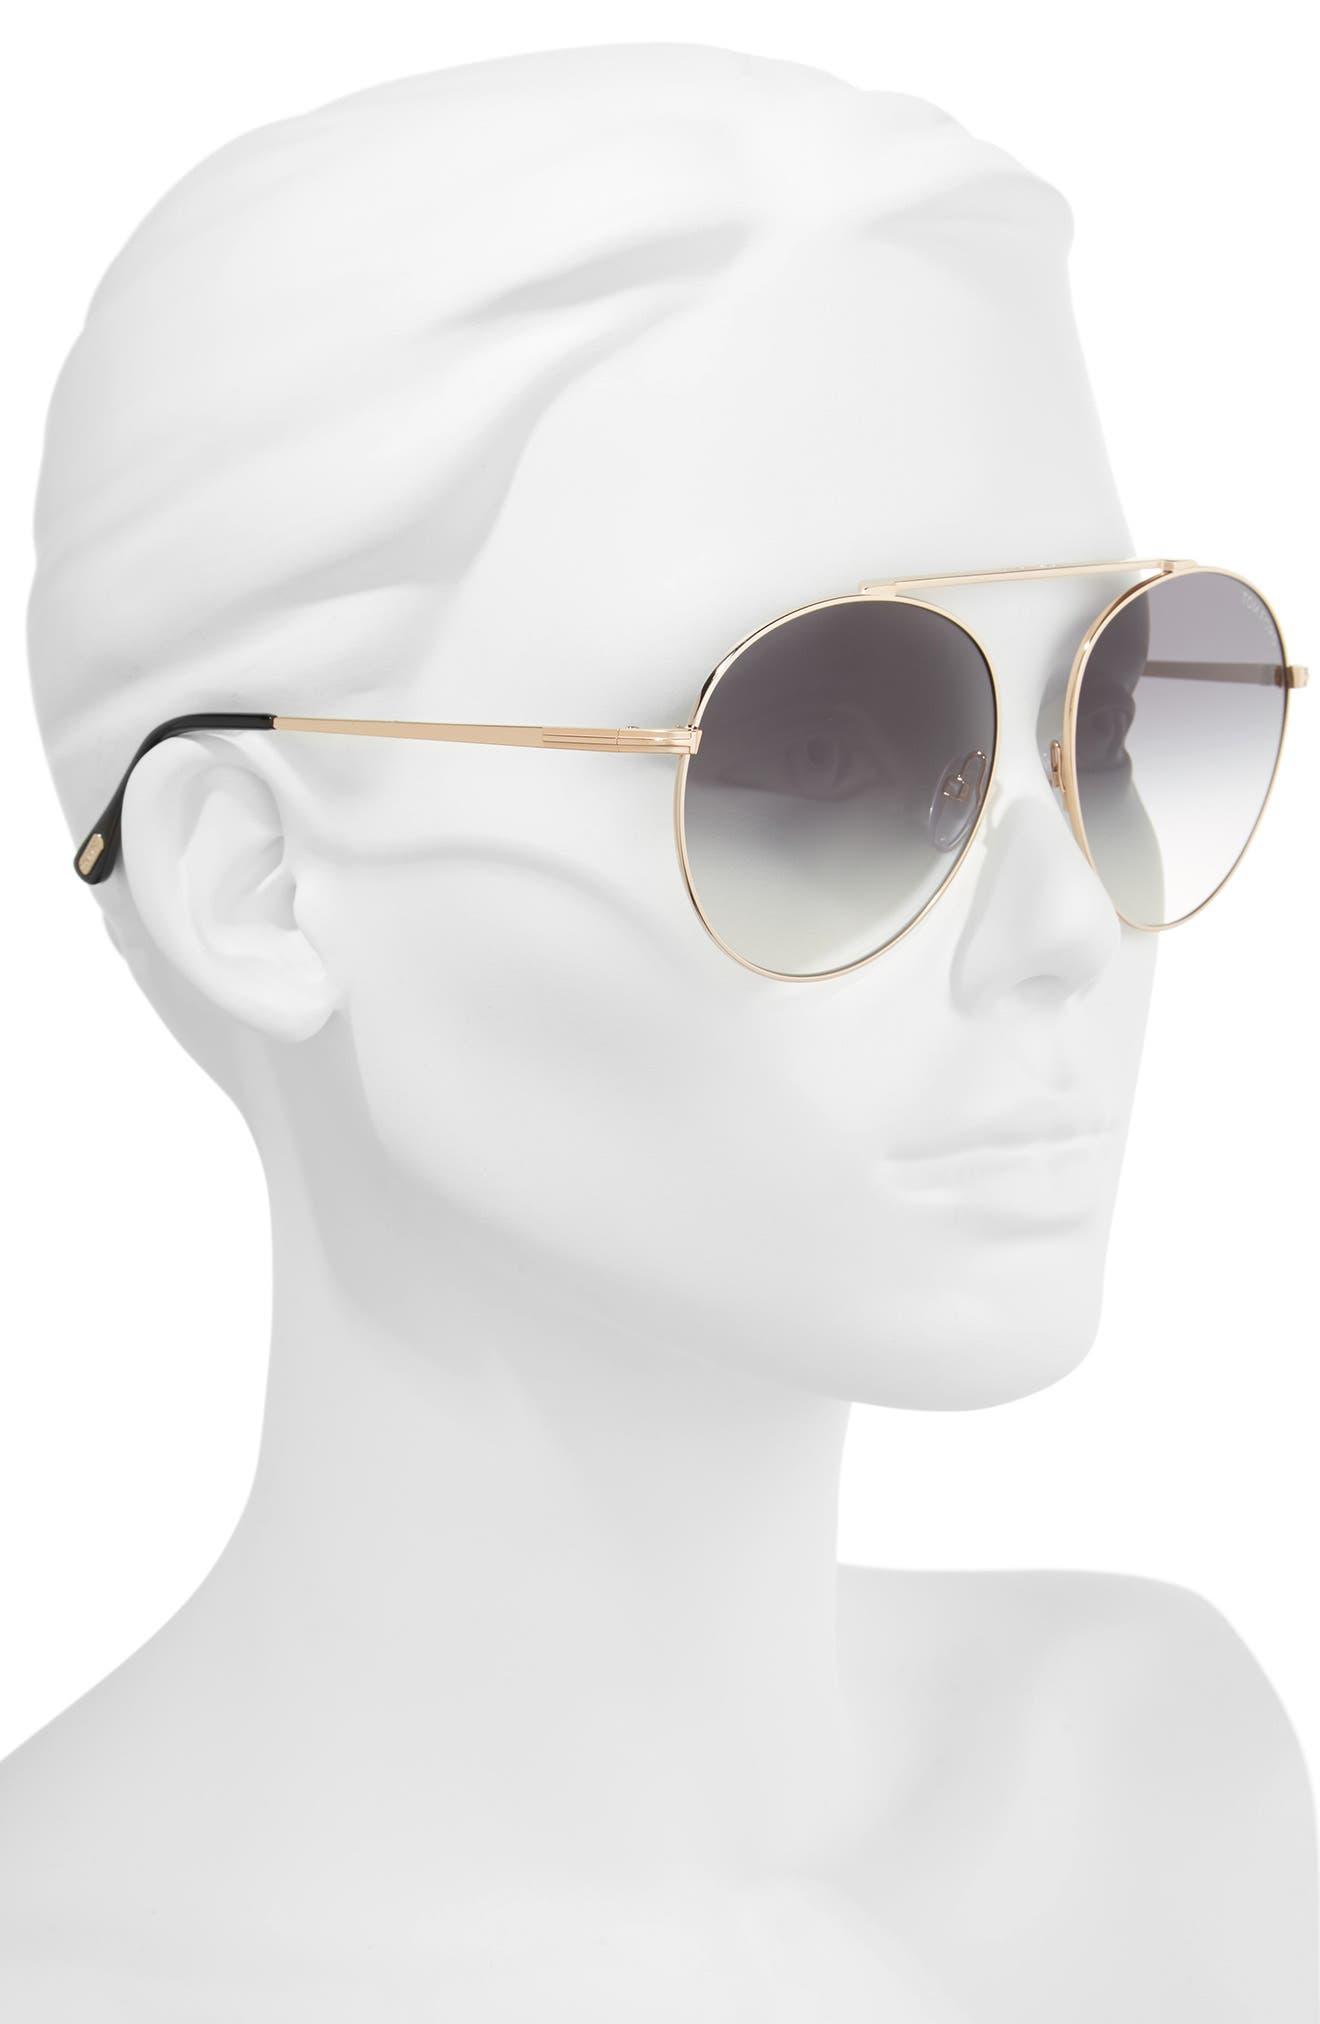 Simone 58mm Gradient Mirrored Round Sunglasses,                             Alternate thumbnail 2, color,                             710